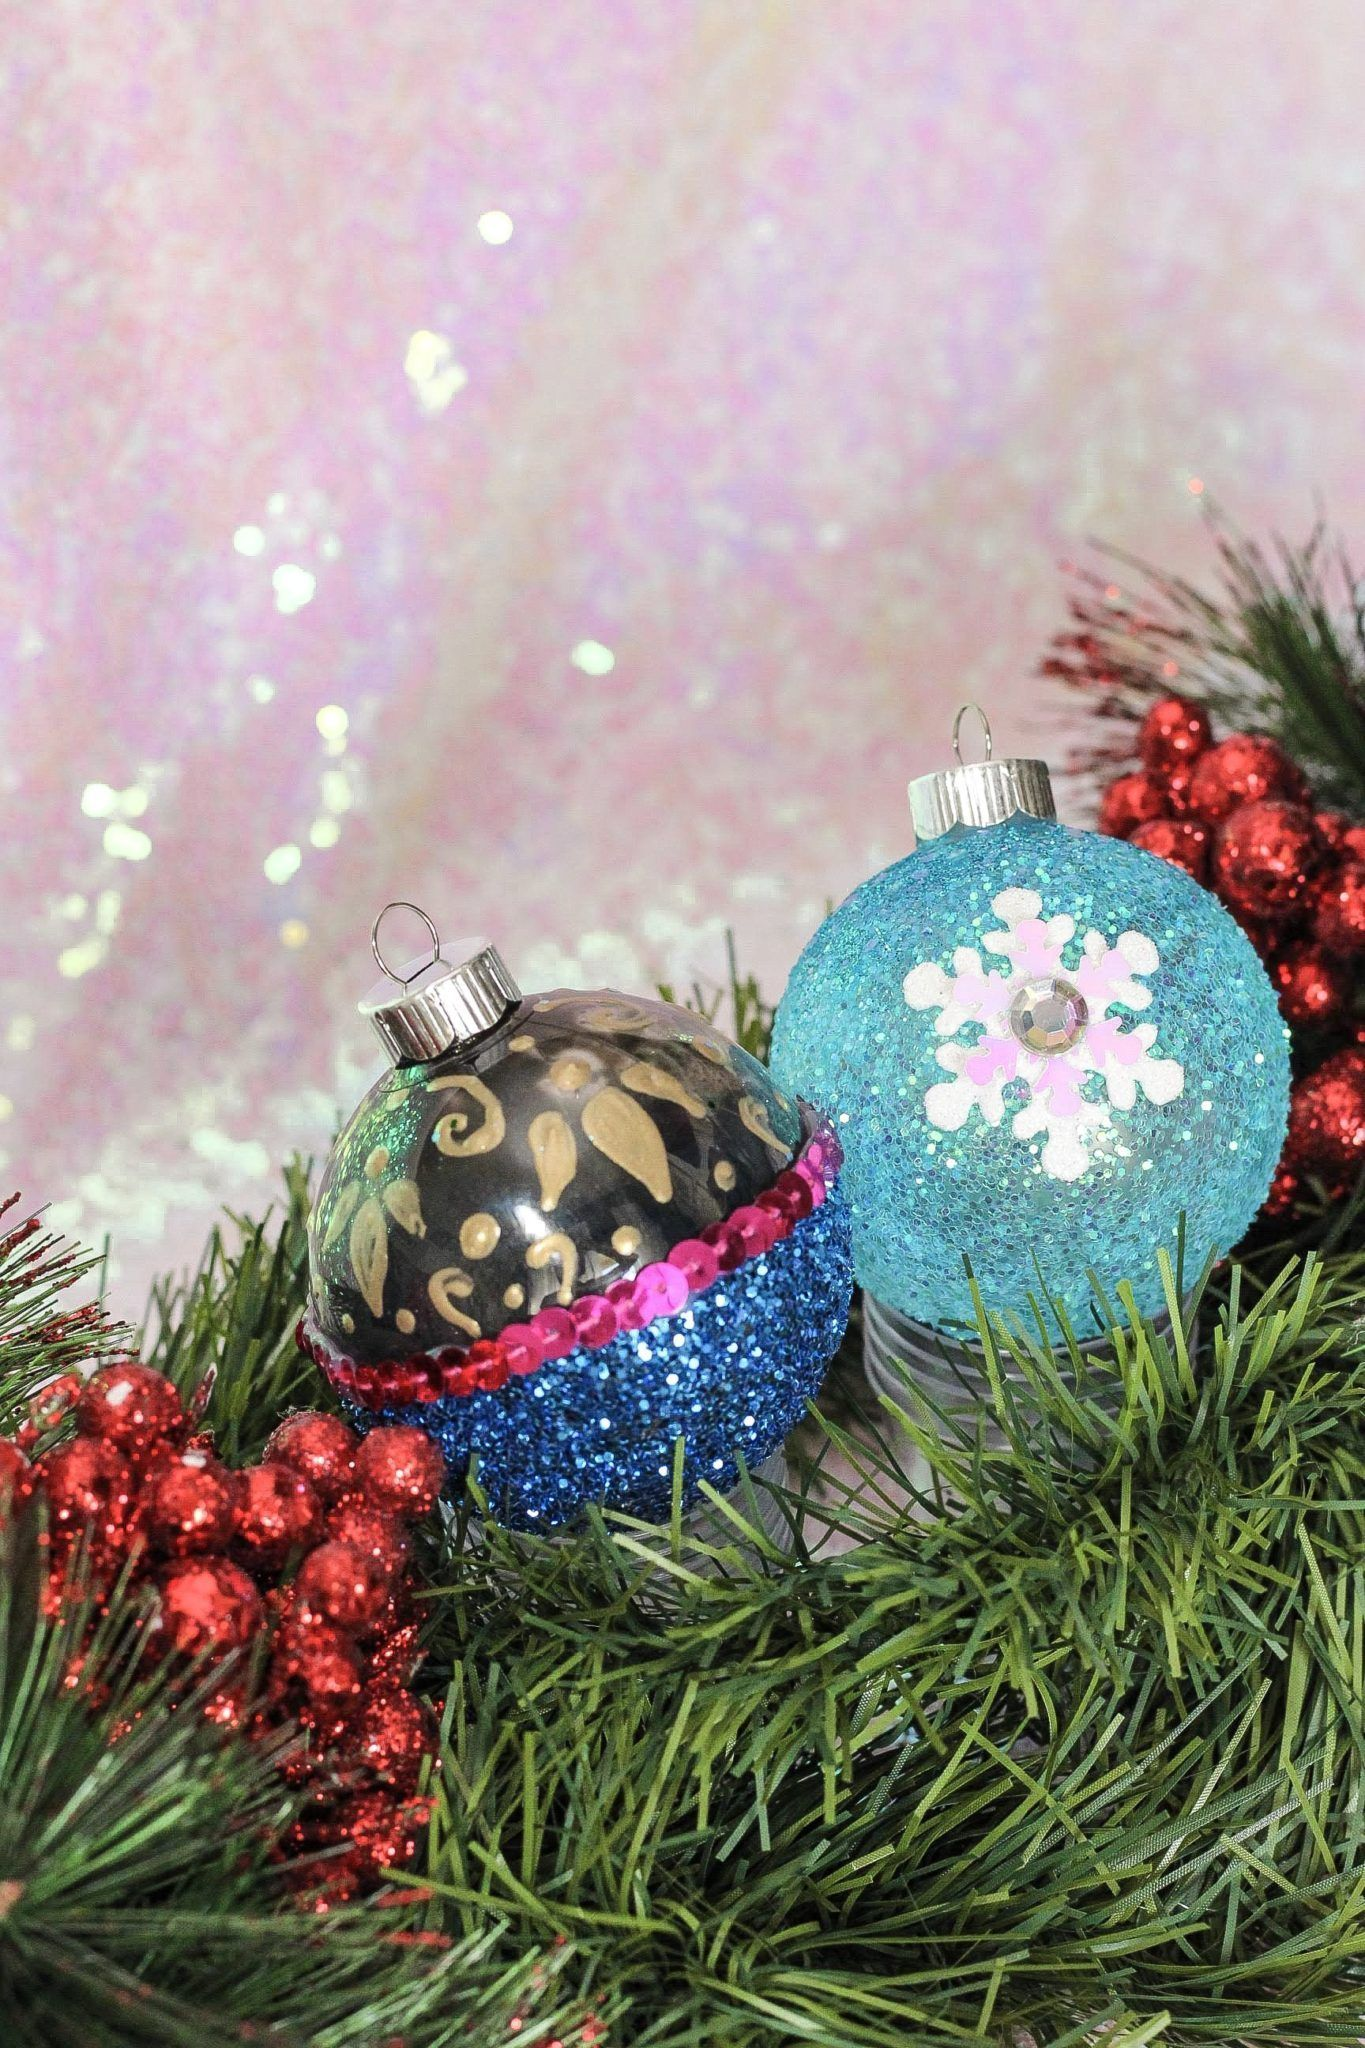 Easy Diy Disney Ornament For Christmas Inspired By Disney Princesses Disney Christmas Ornaments Disney Ornaments Diy Disney Christmas Diy